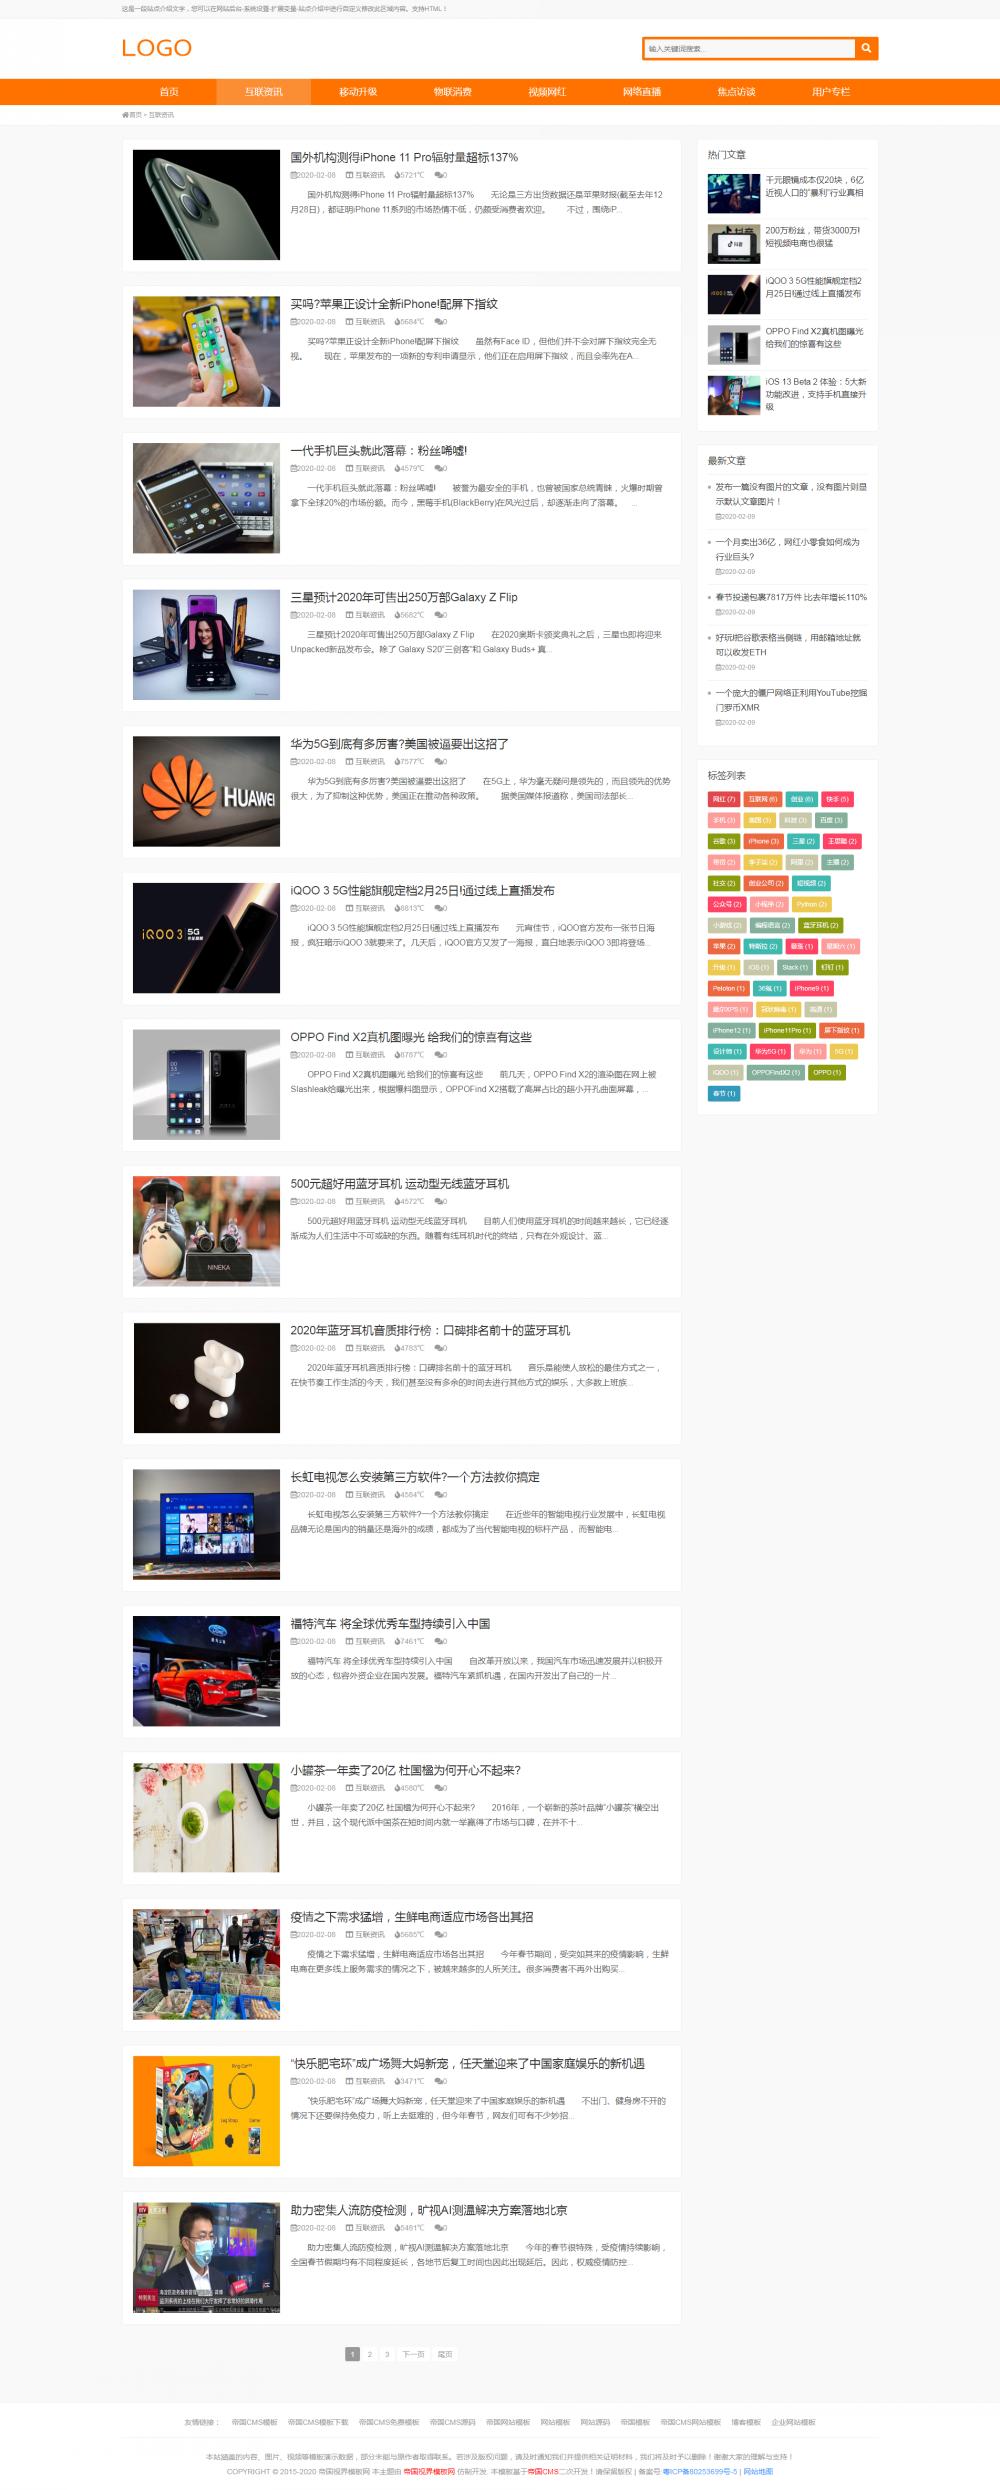 [DG-091]帝国CMS自适应橙色文章模板,帝国CMS响应式新闻资讯模板 [DG-091]帝国CMS自适应橙色文章模板,帝国CMS响应式新闻资讯模板 新闻资讯 第2张